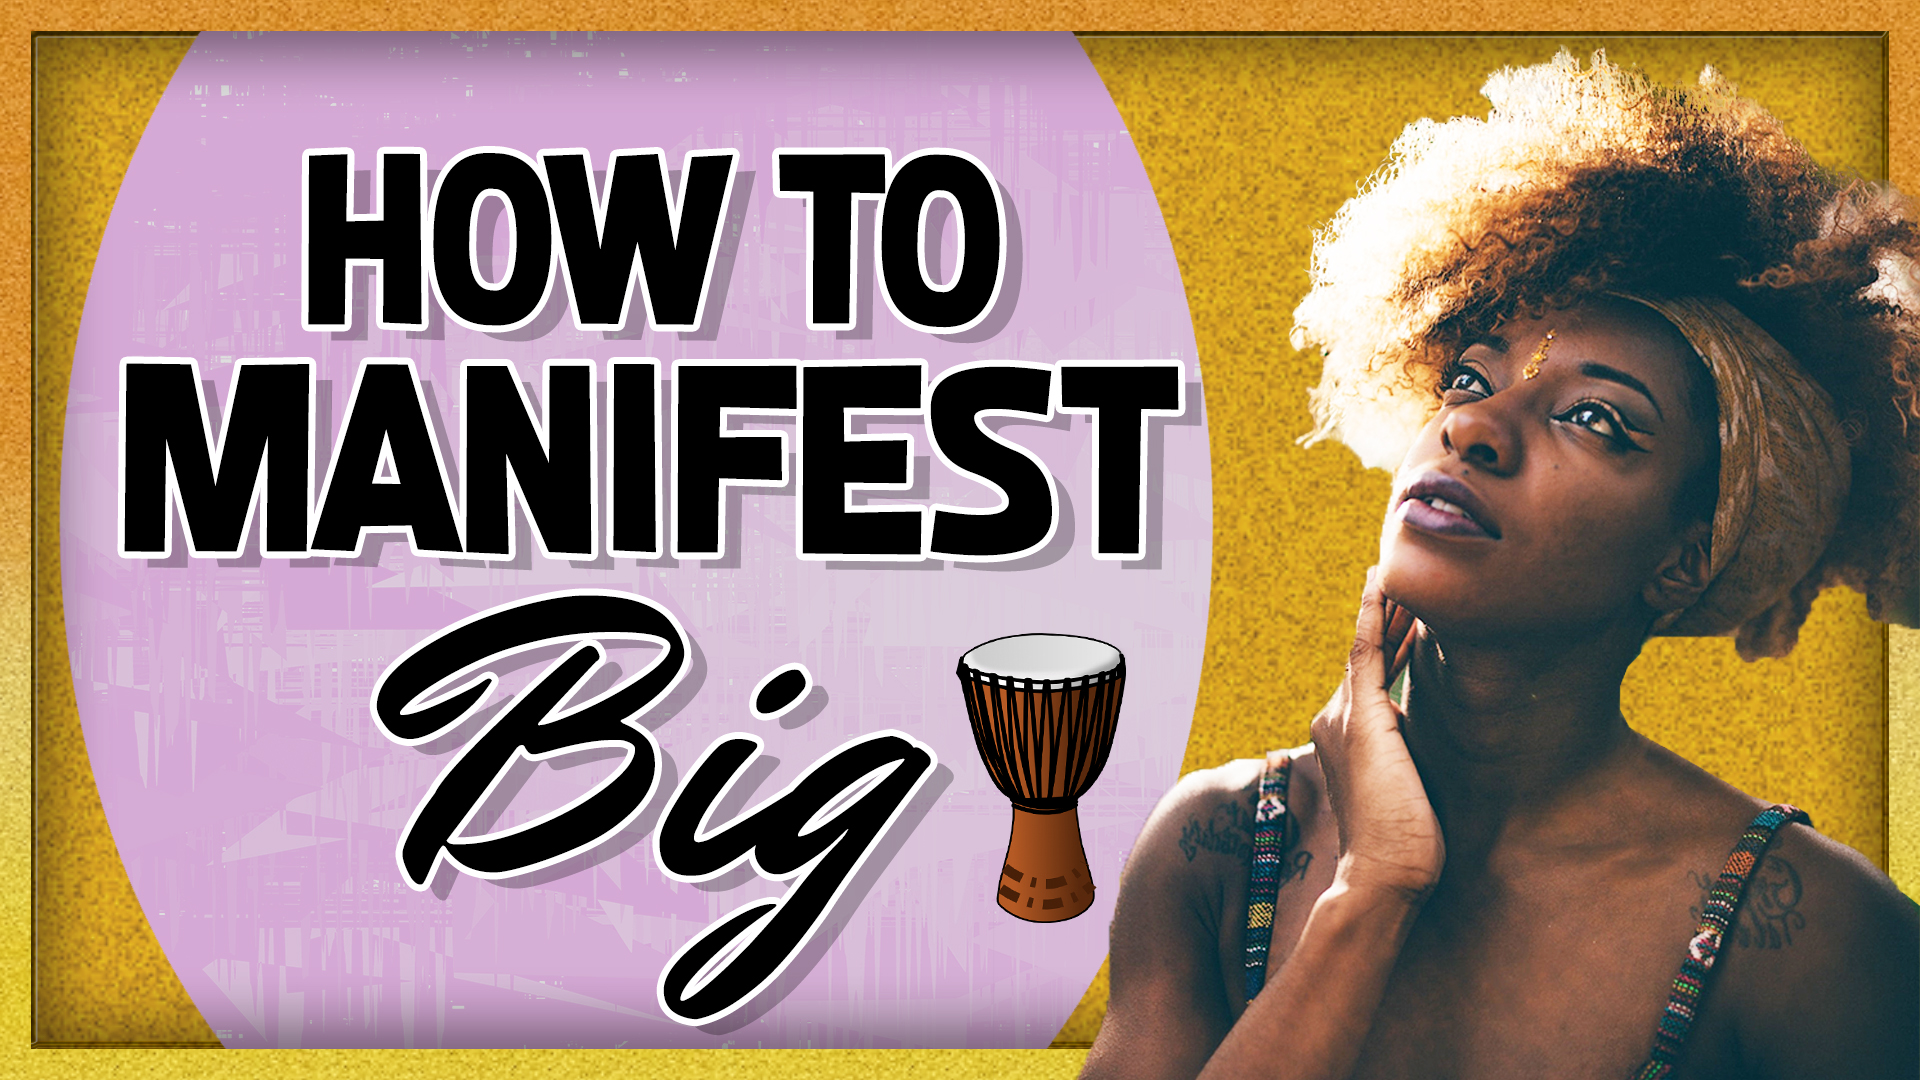 Drumming and Manifestation Party to Celebrate Manifesting Something Big